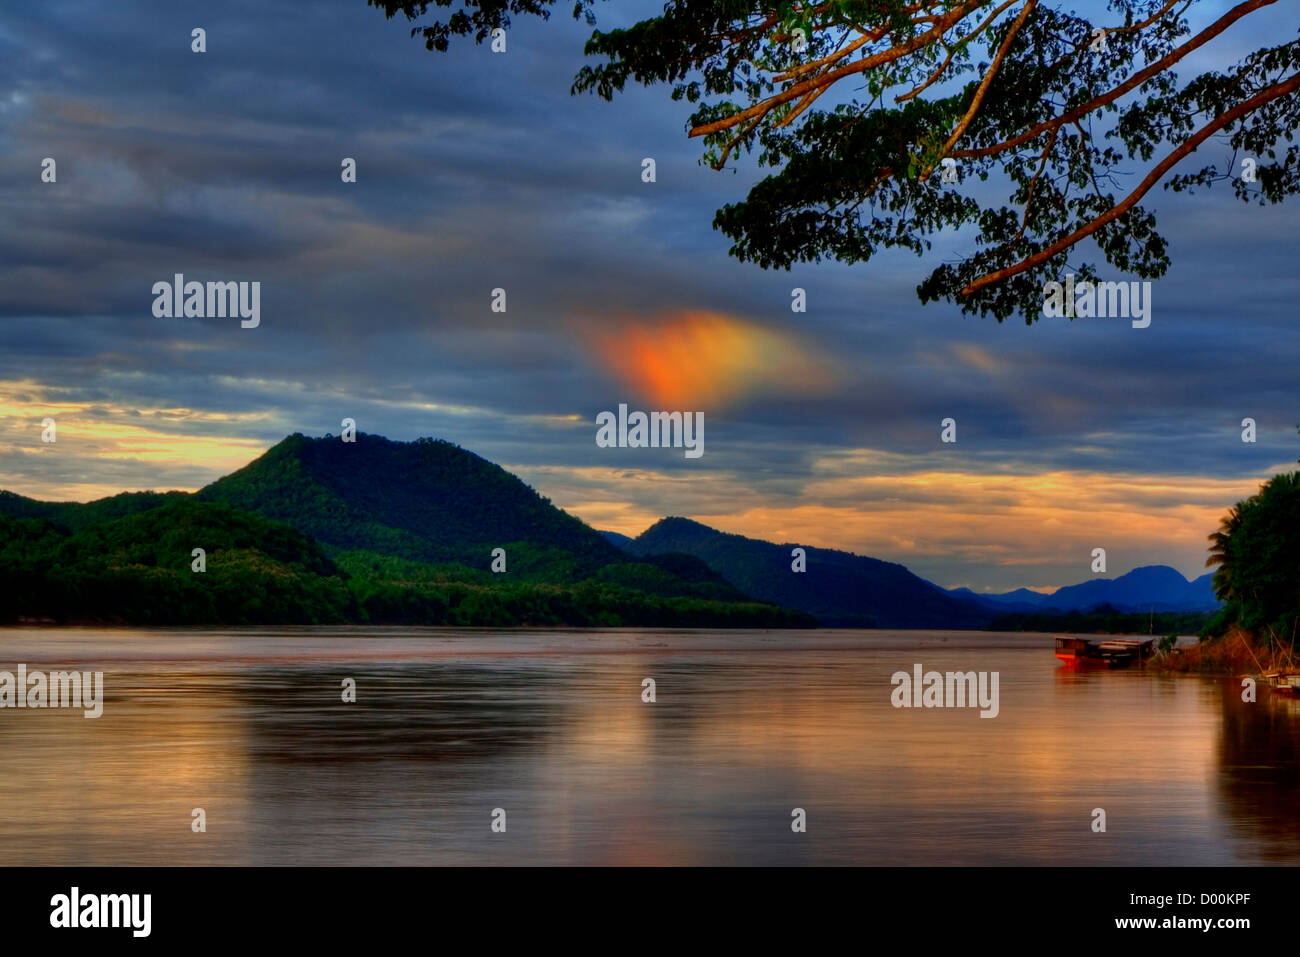 A phenomena called Sundog took place over the Mekong river, Luang Prabang - Stock Image